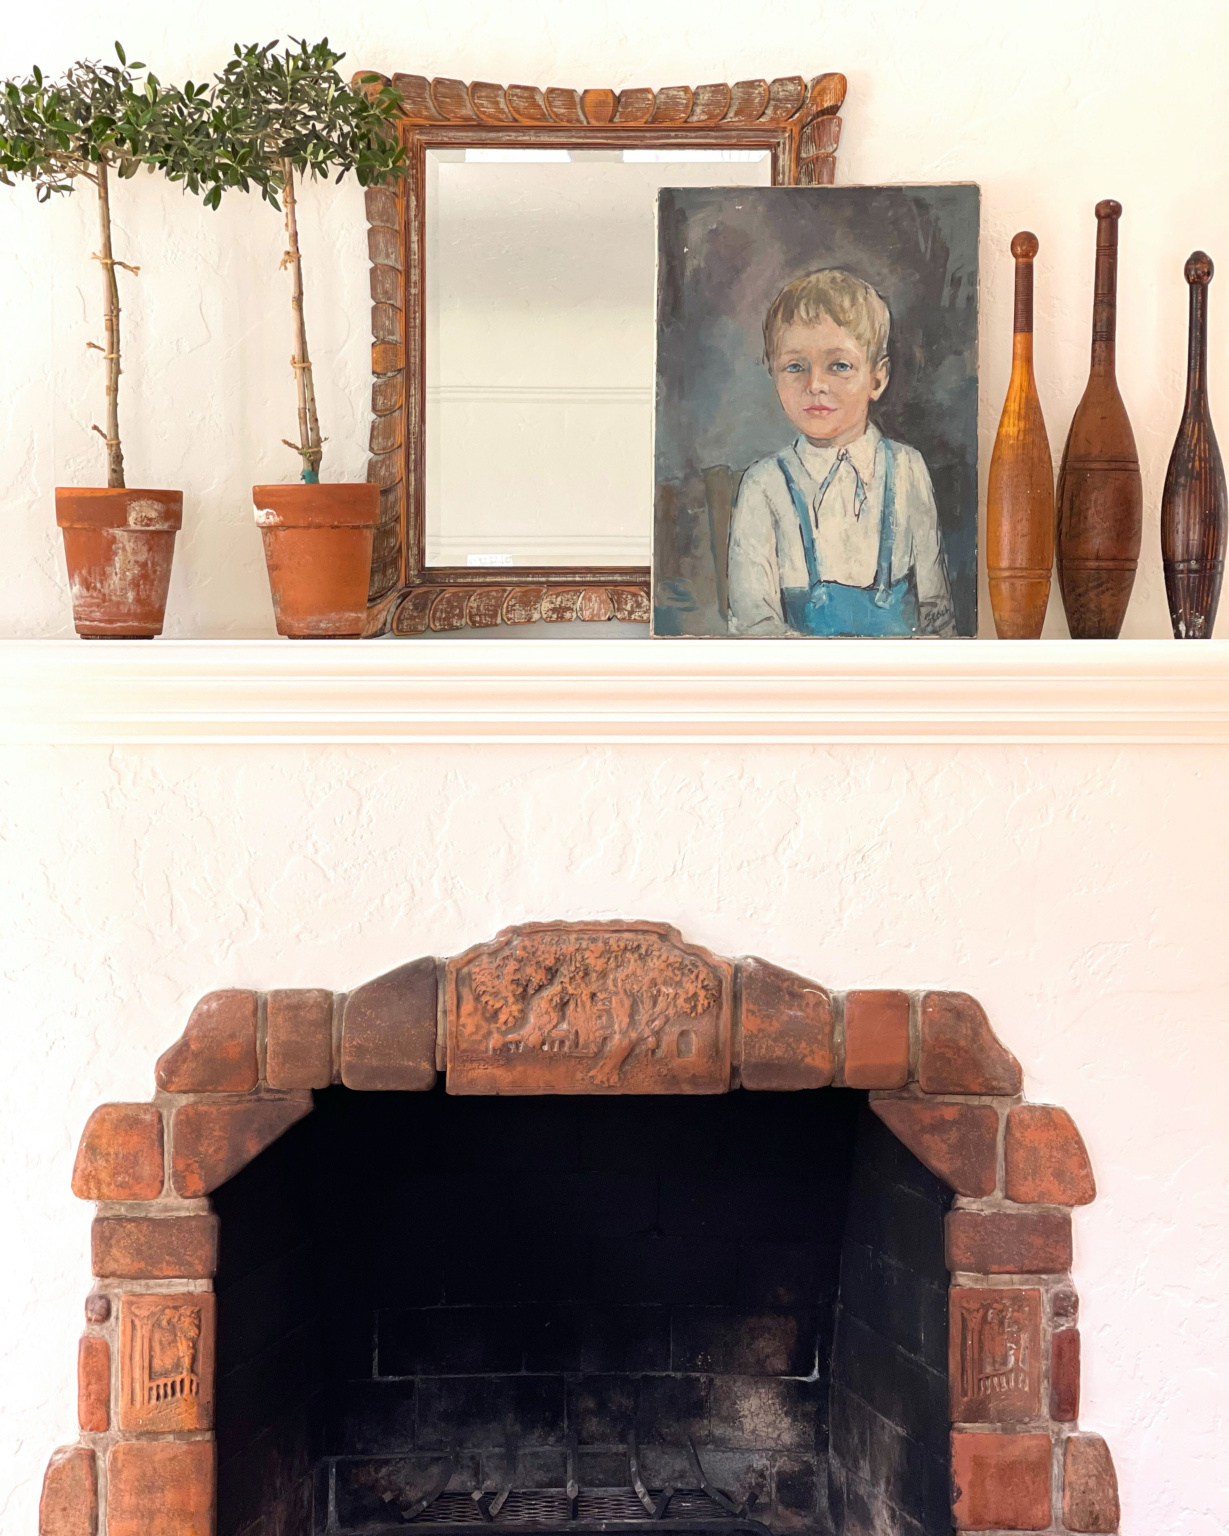 cindy hattersley's fireplace mantel